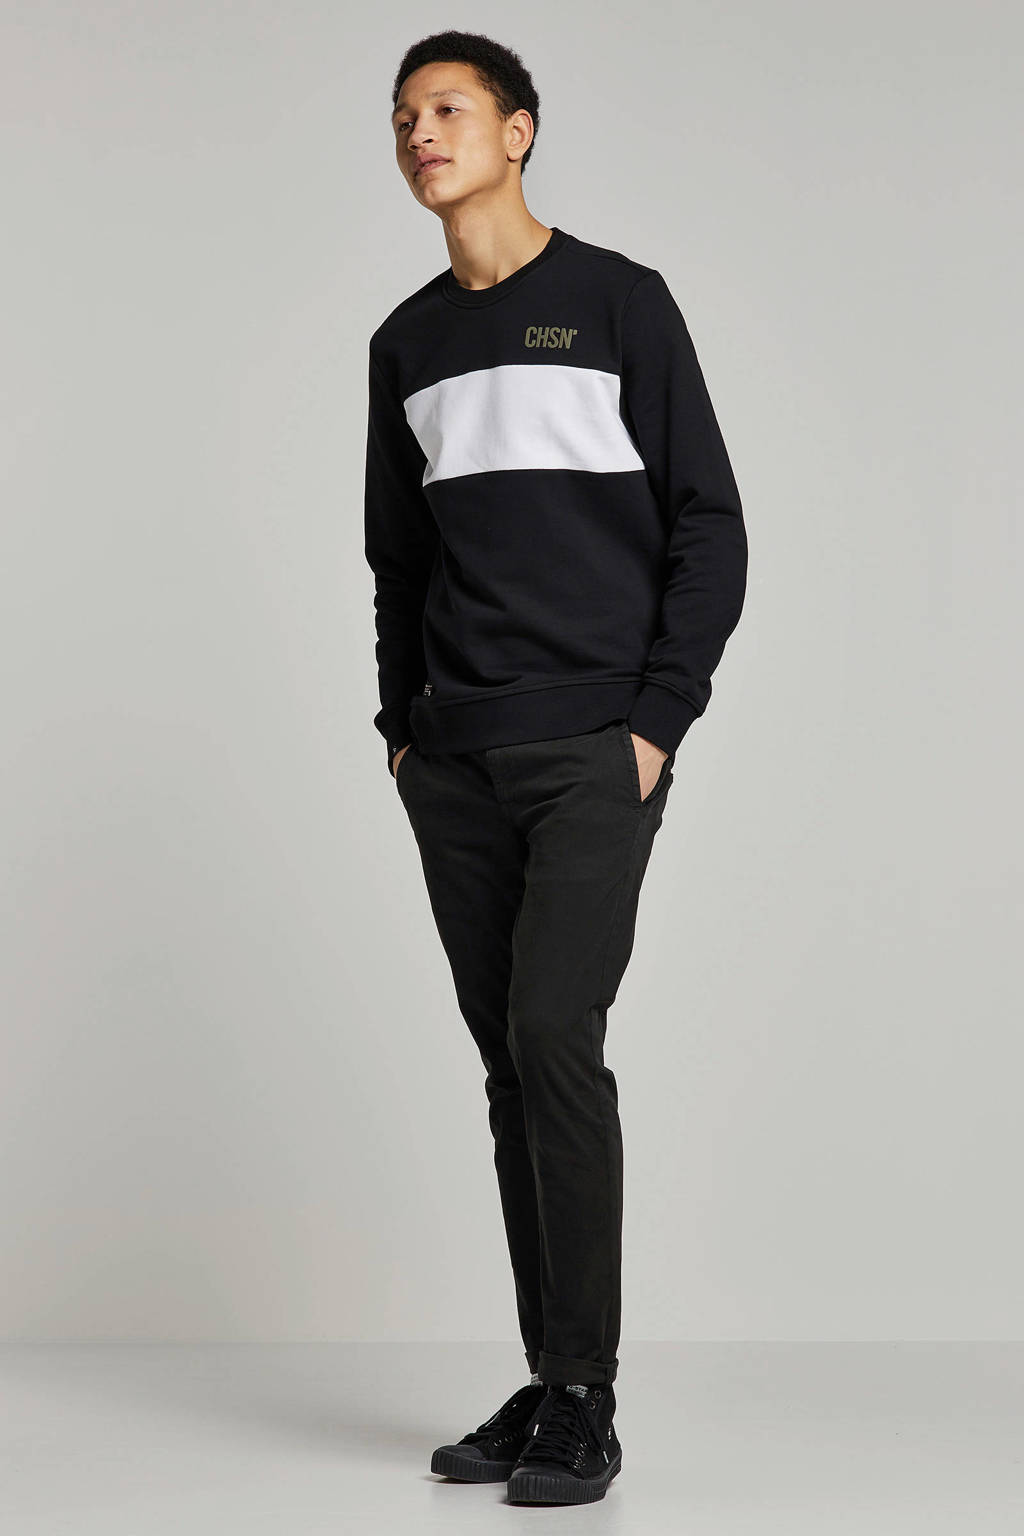 Chasin' sweater, Zwart/wit